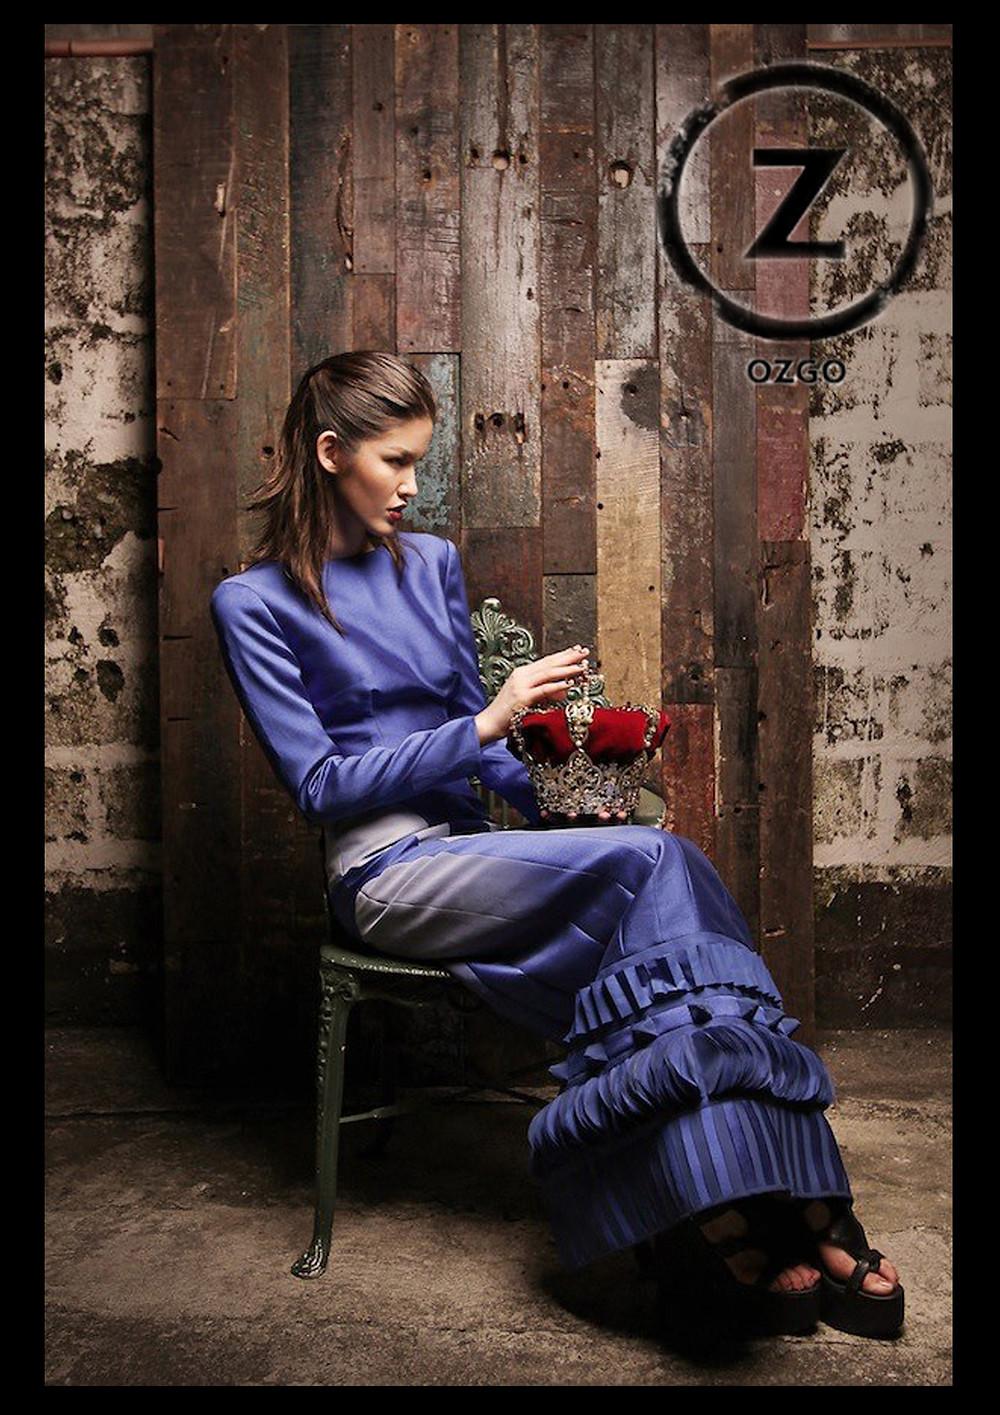 Fashion Designer Oz Go